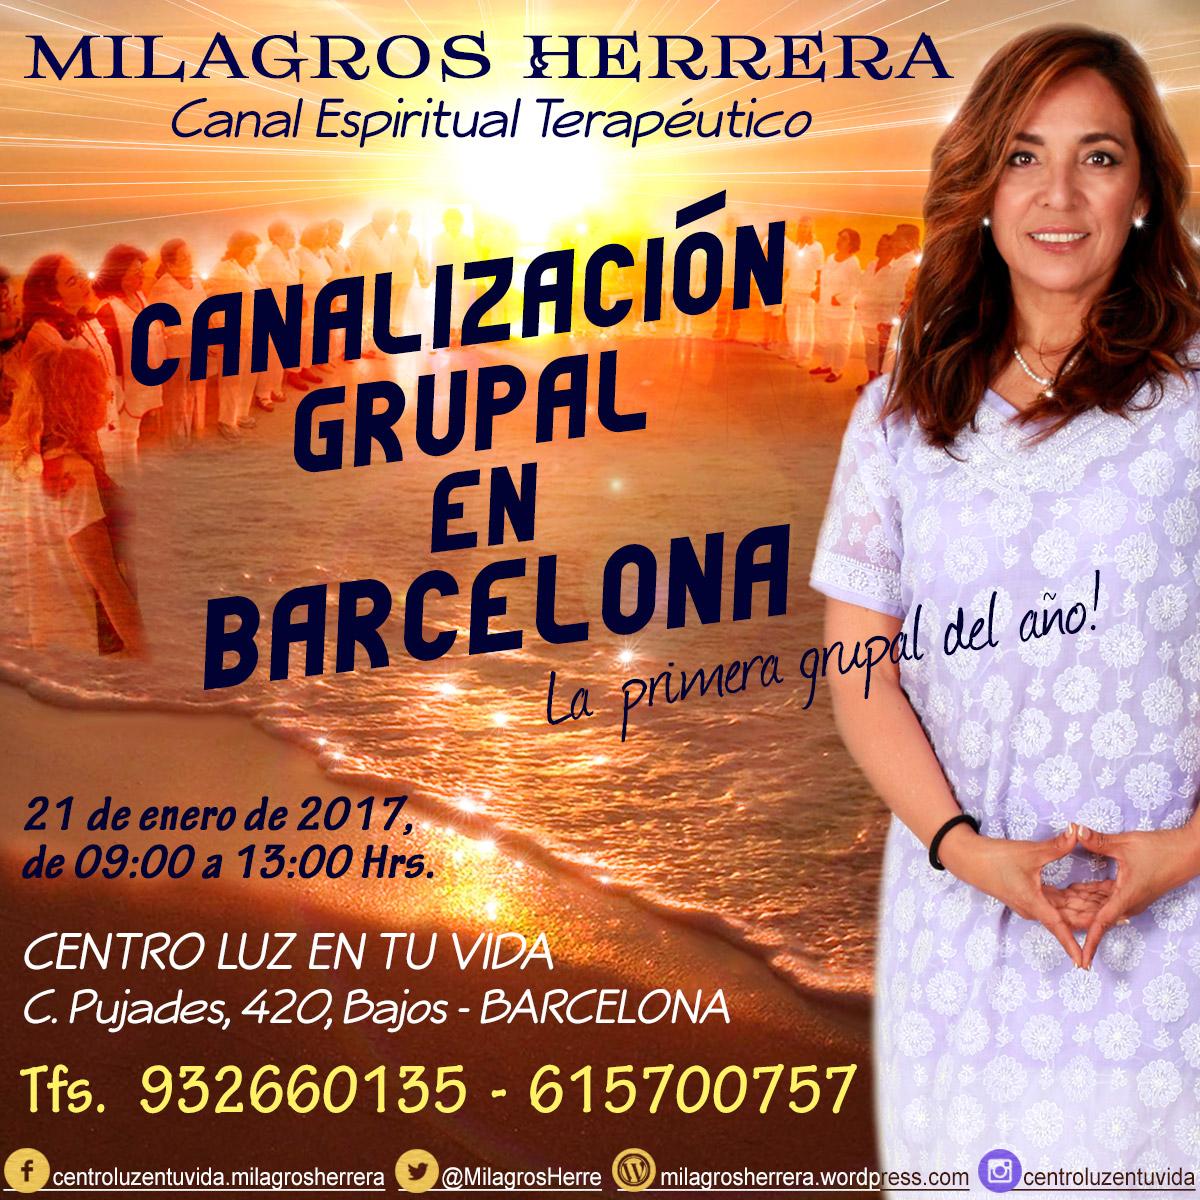 Milagros Herrera, Canal Espiritual, 932 660 135